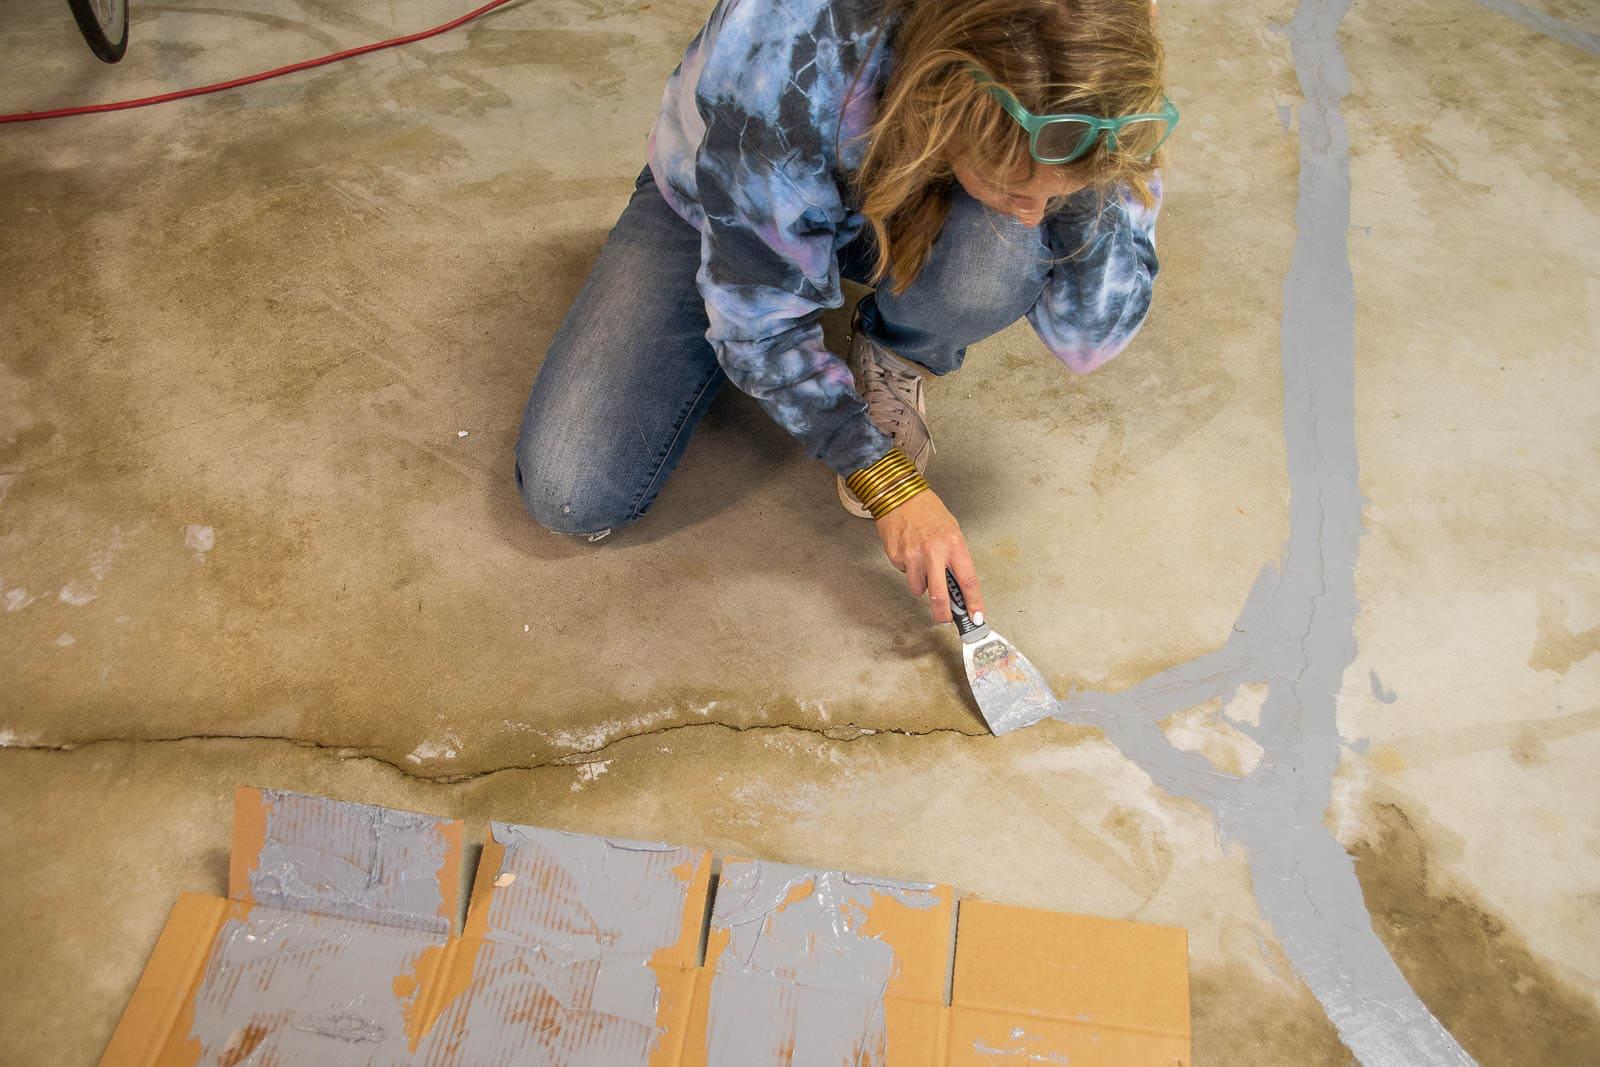 patching the floor cracks